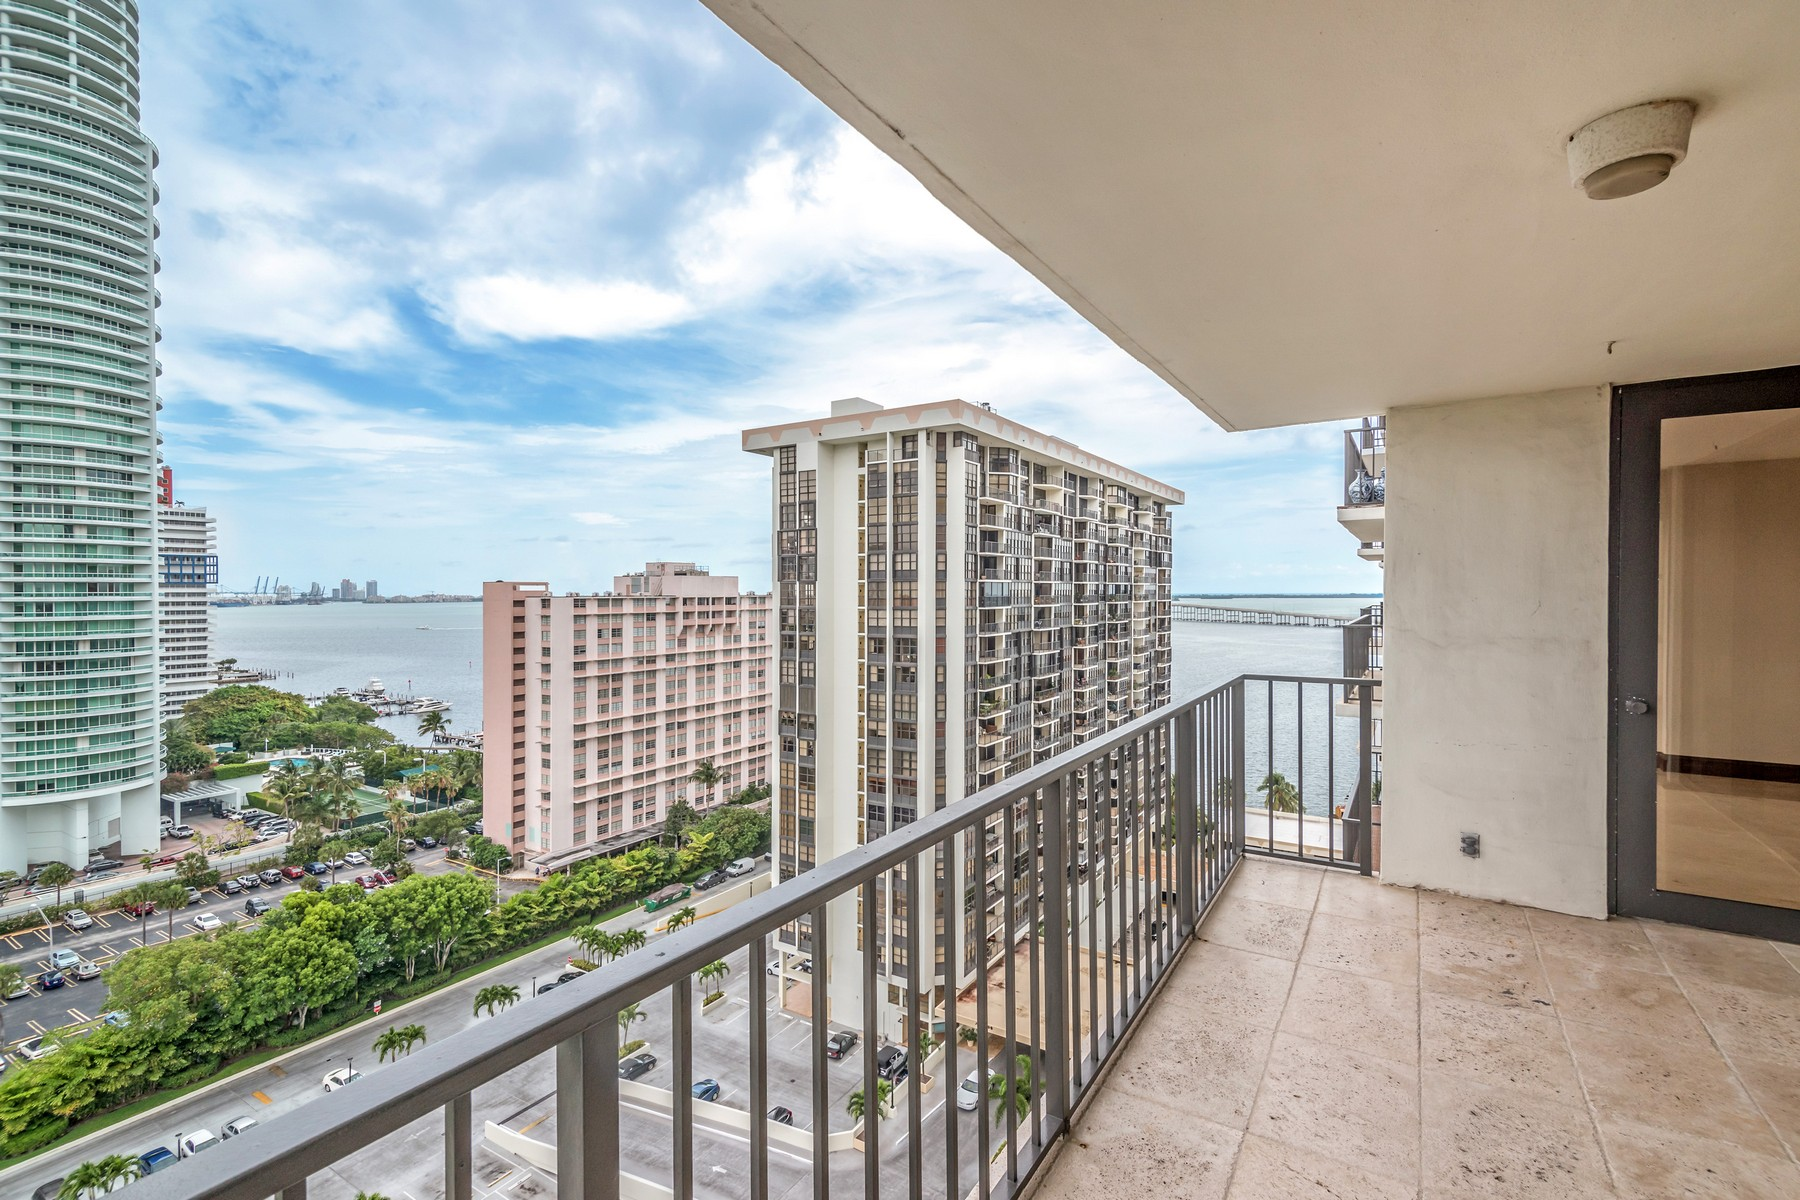 Condominium for Sale at 1901 Brickell Ave #B1809 1901 Brickell Ave B-1809 Miami, Florida 33129 United States